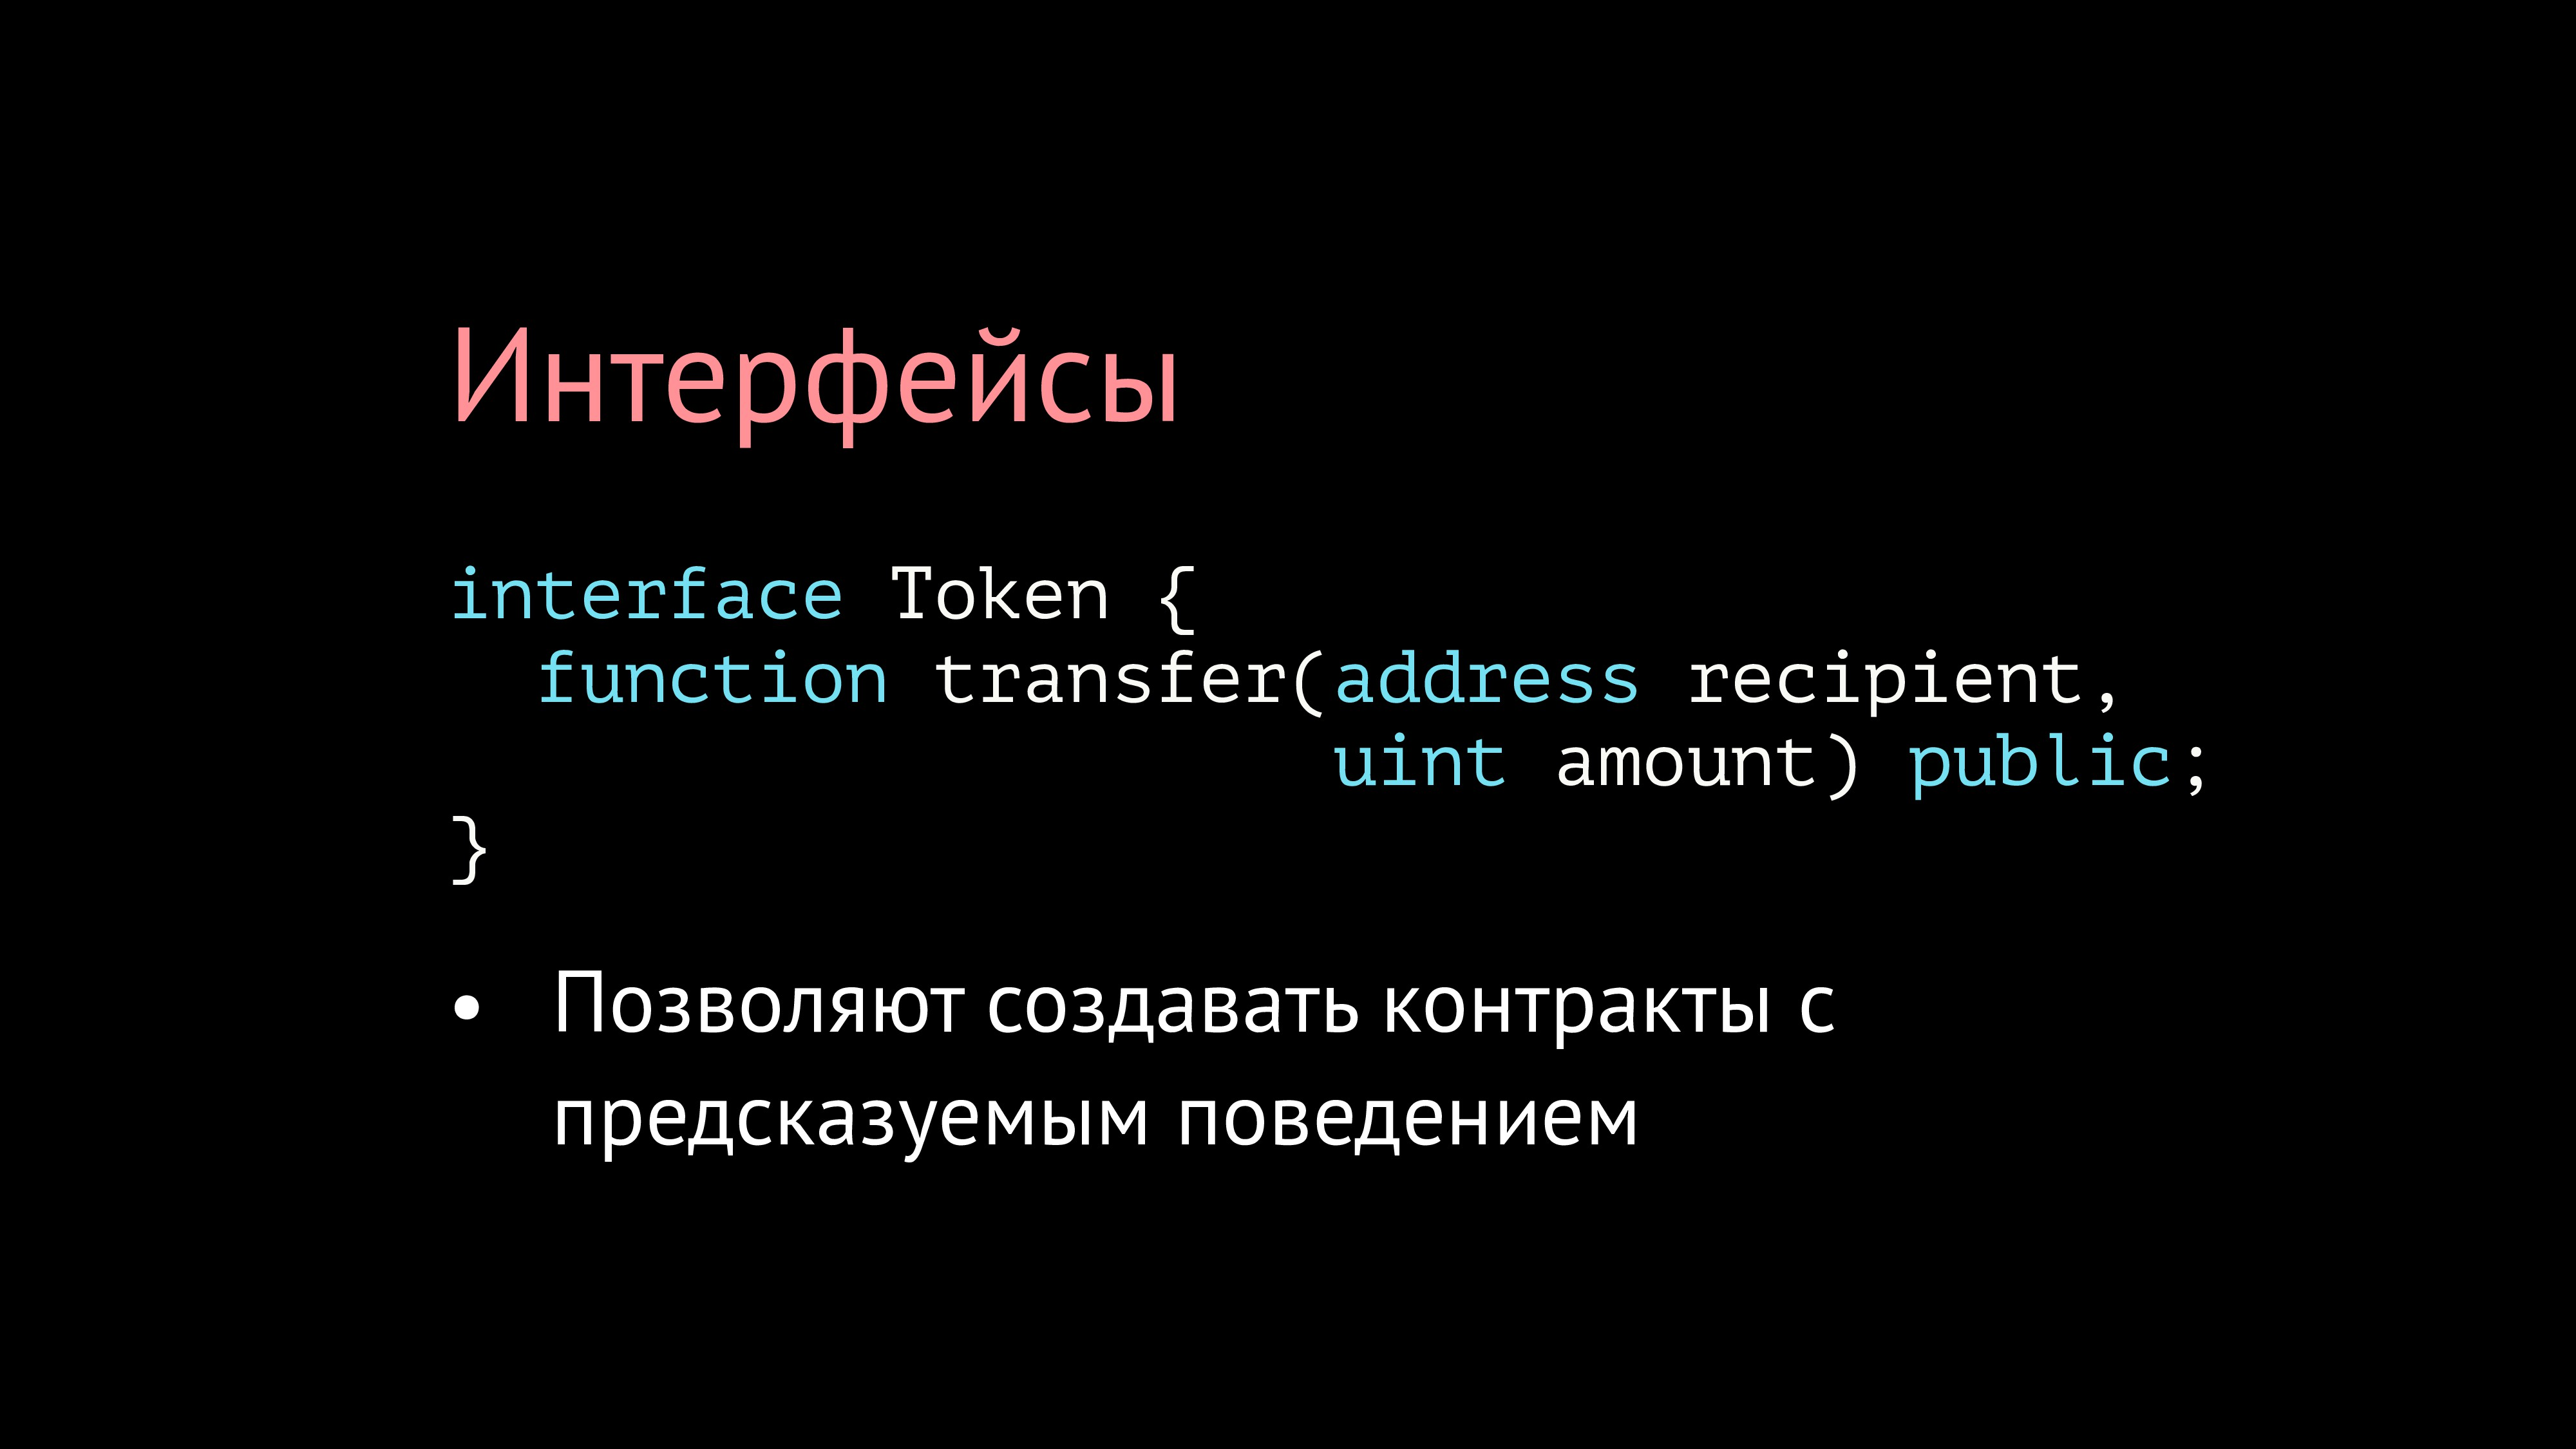 Интерфейсы interface Token { function transfer(...